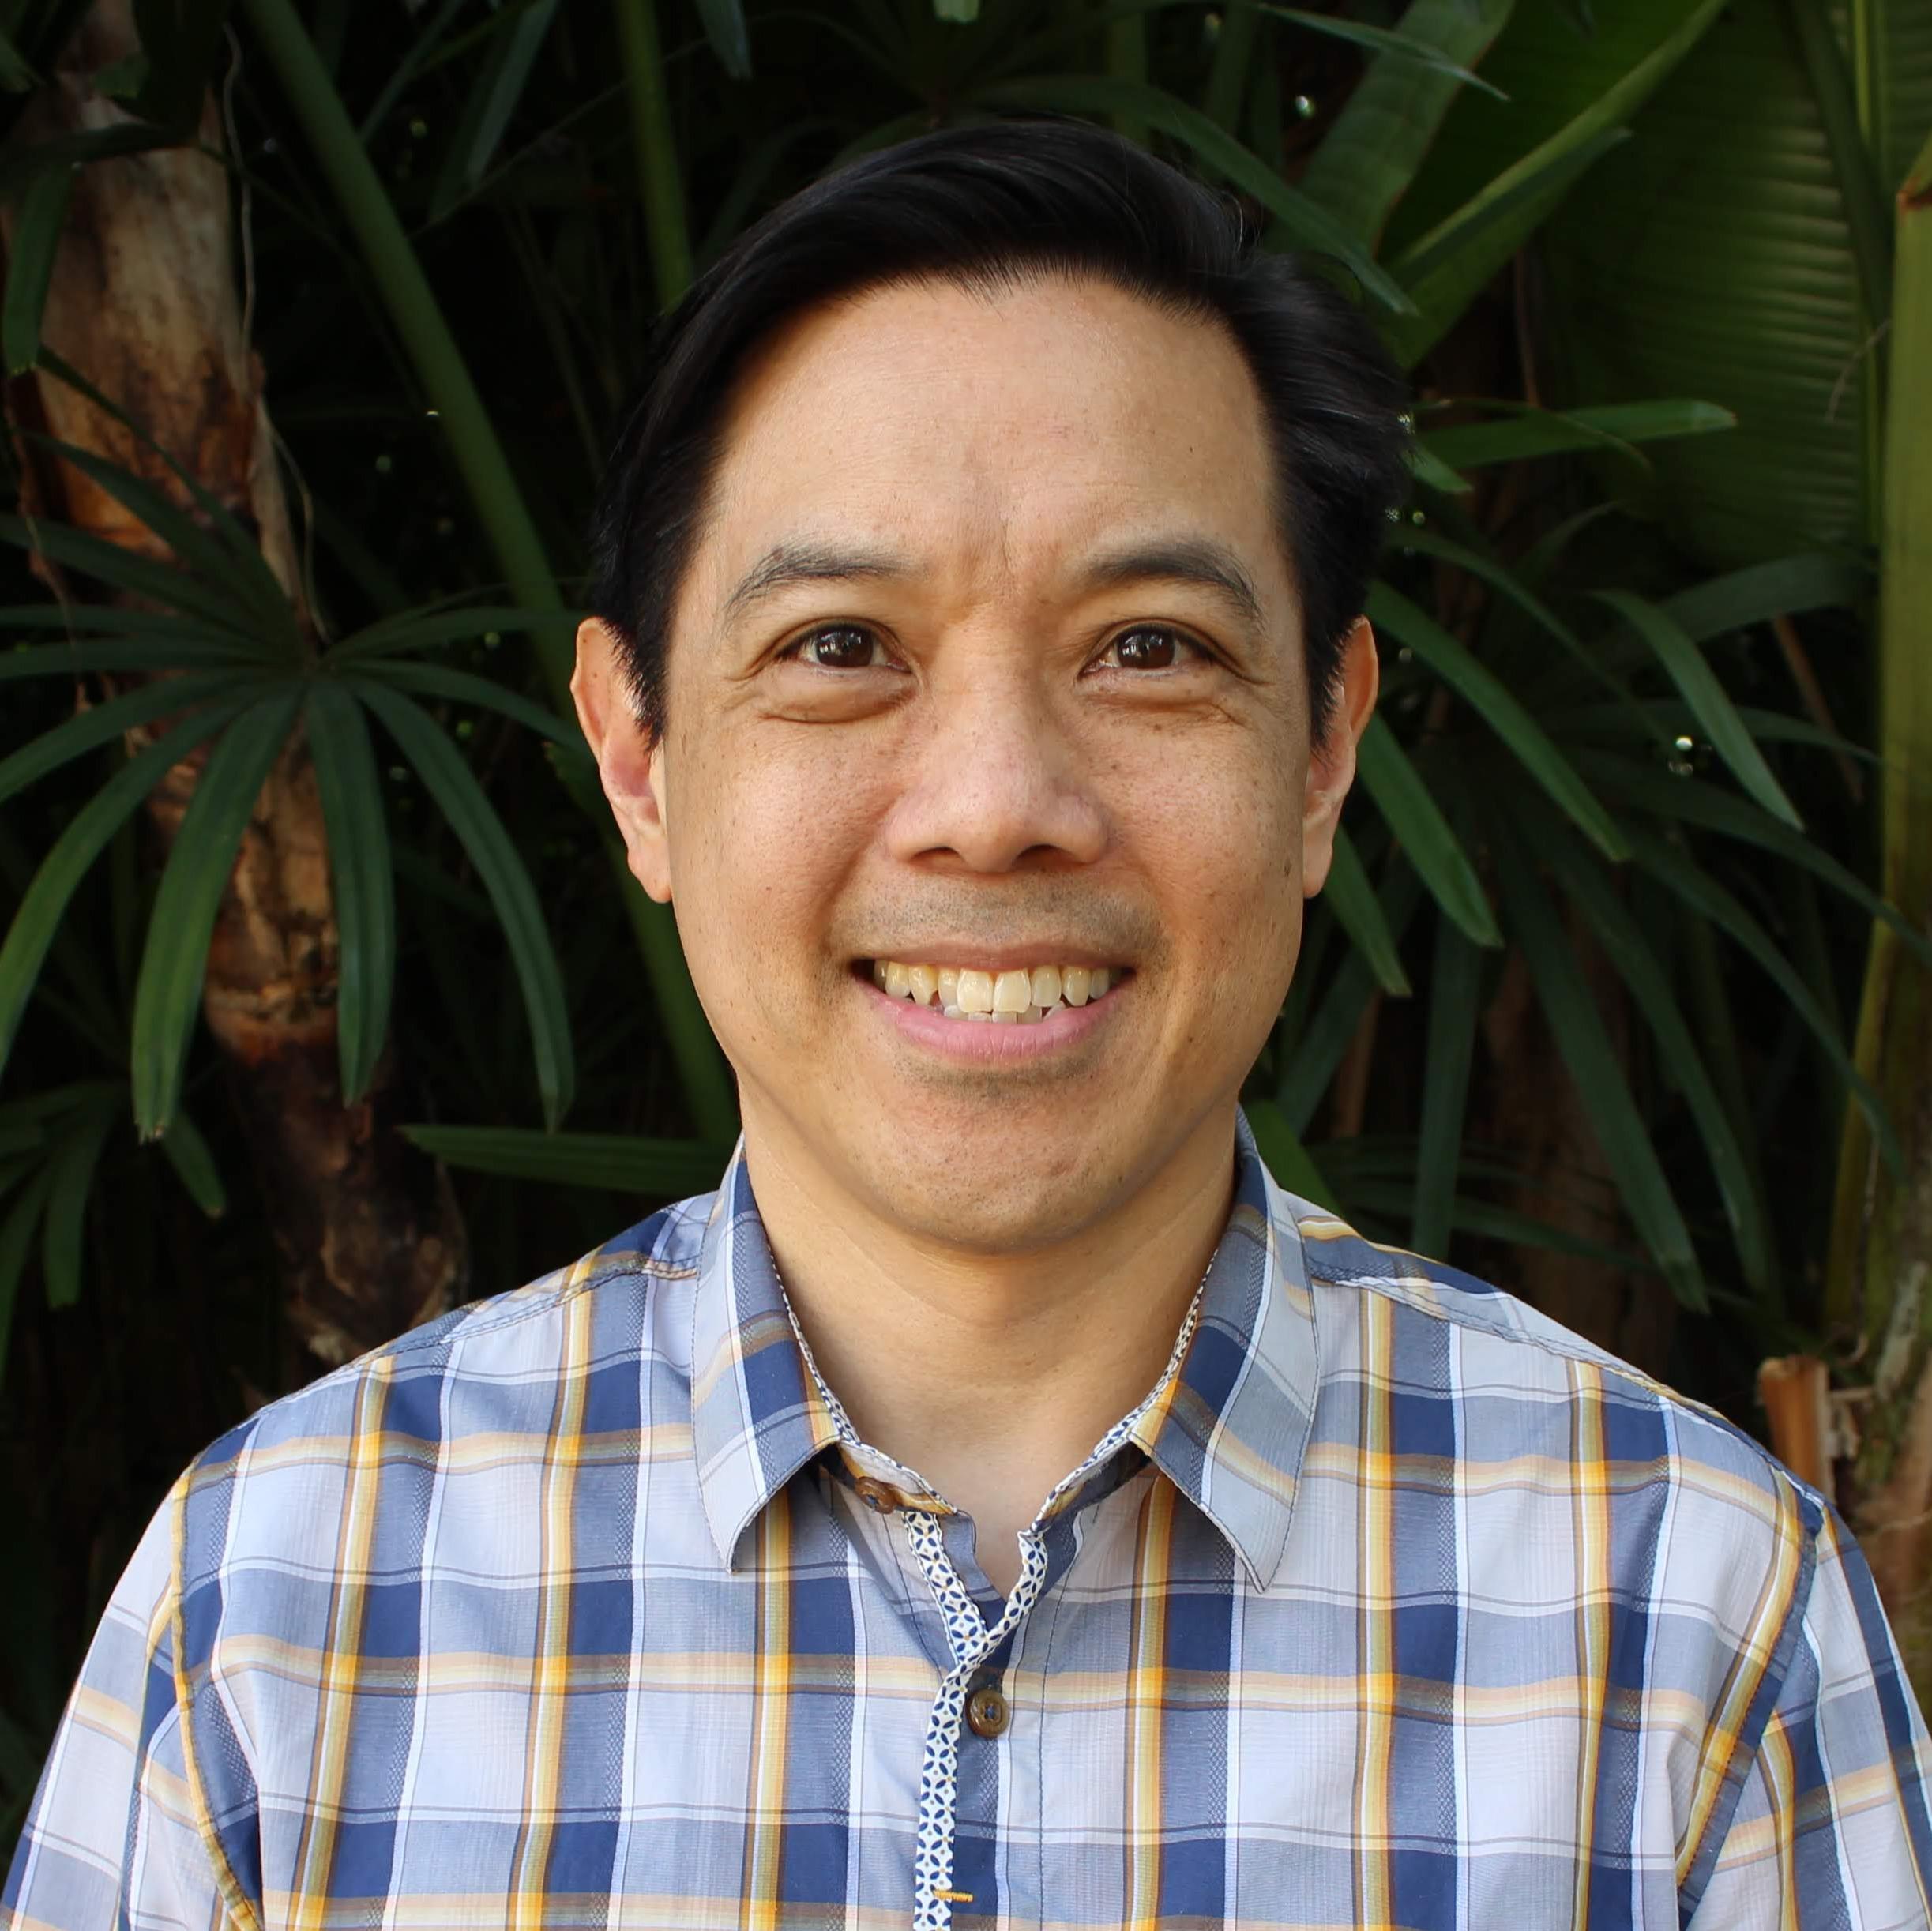 Joel Remigio